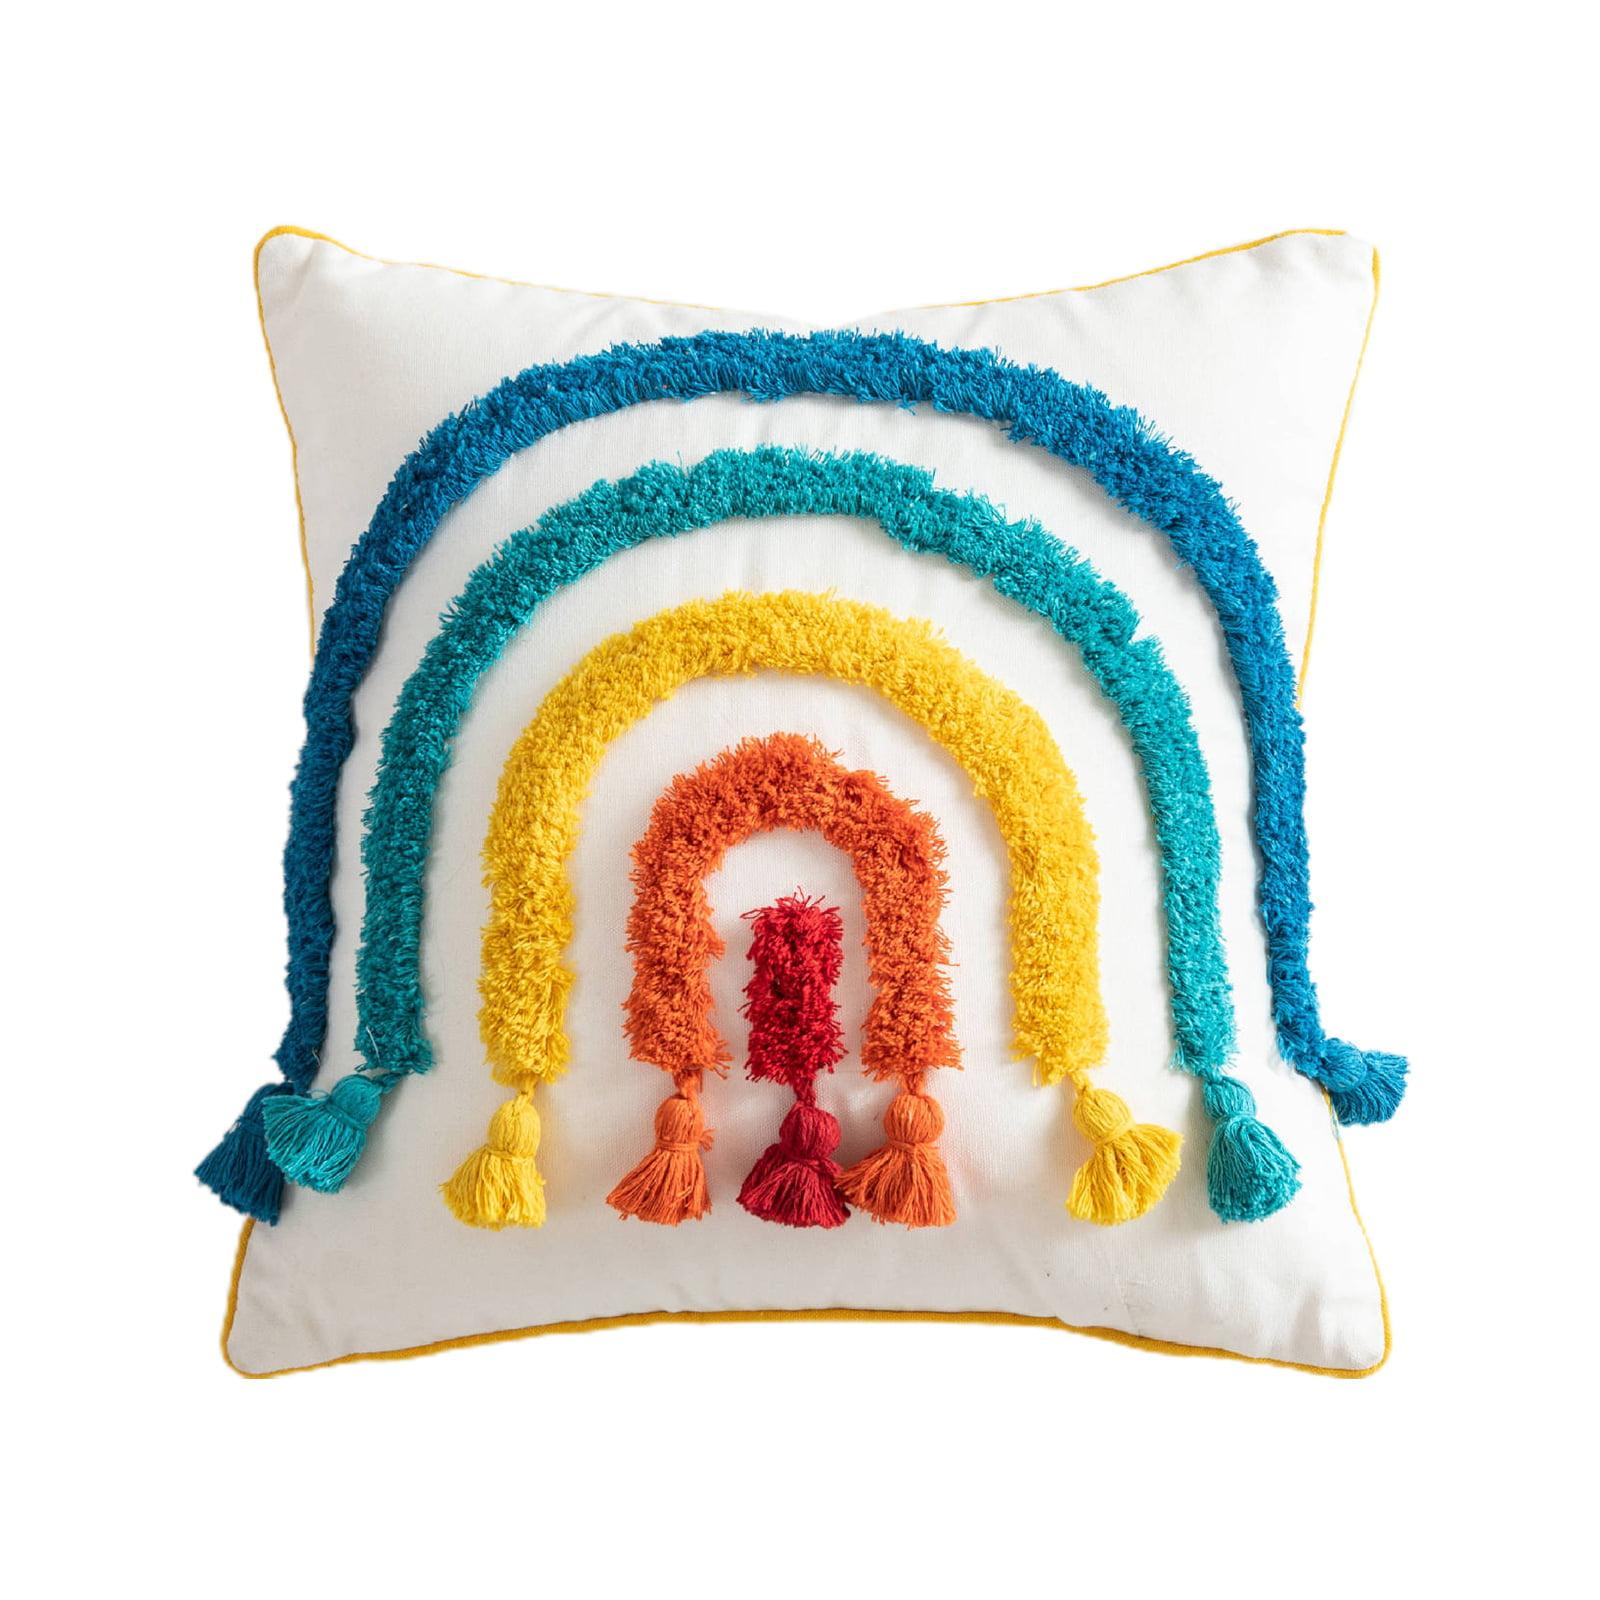 Estone Morocco Throw Pillow Case Colorful Rainbow Bridge Tufted Tassel Cushion Cover Walmart Com Walmart Com